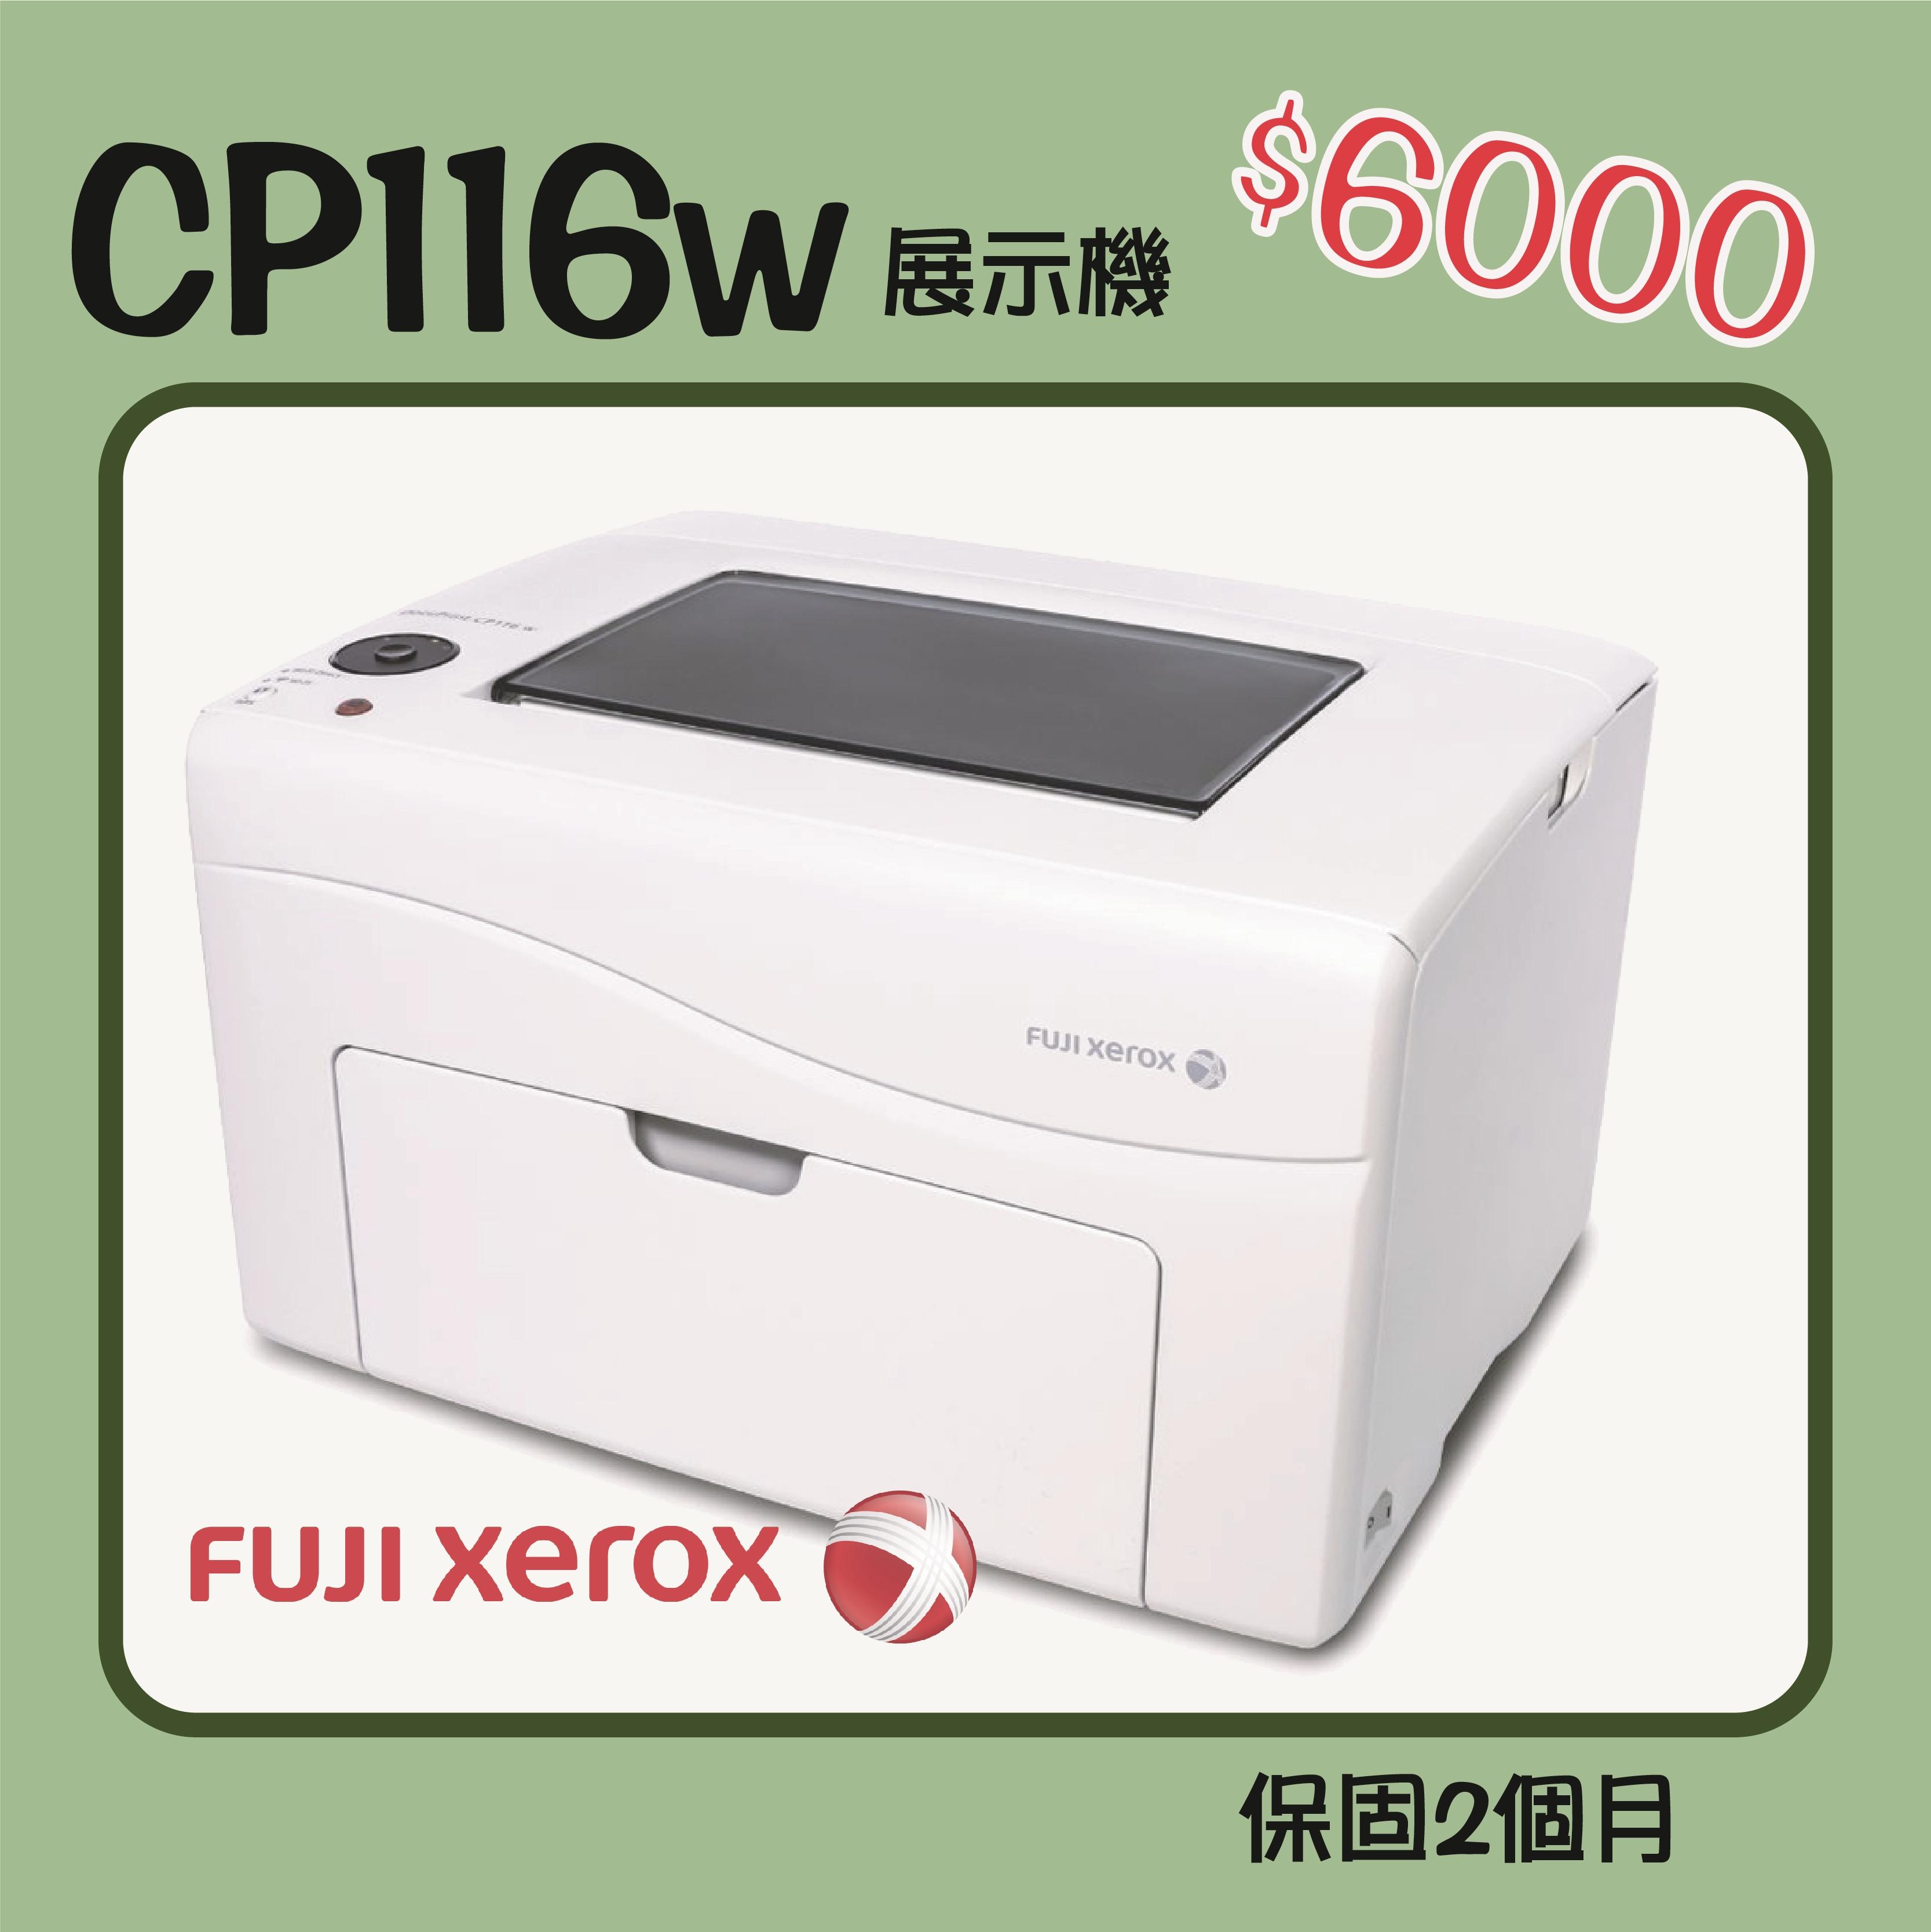 FujiXerox CP116w (展示機) 彩色 S-LED 無線 網路 印表機 全彩 雷射印表機